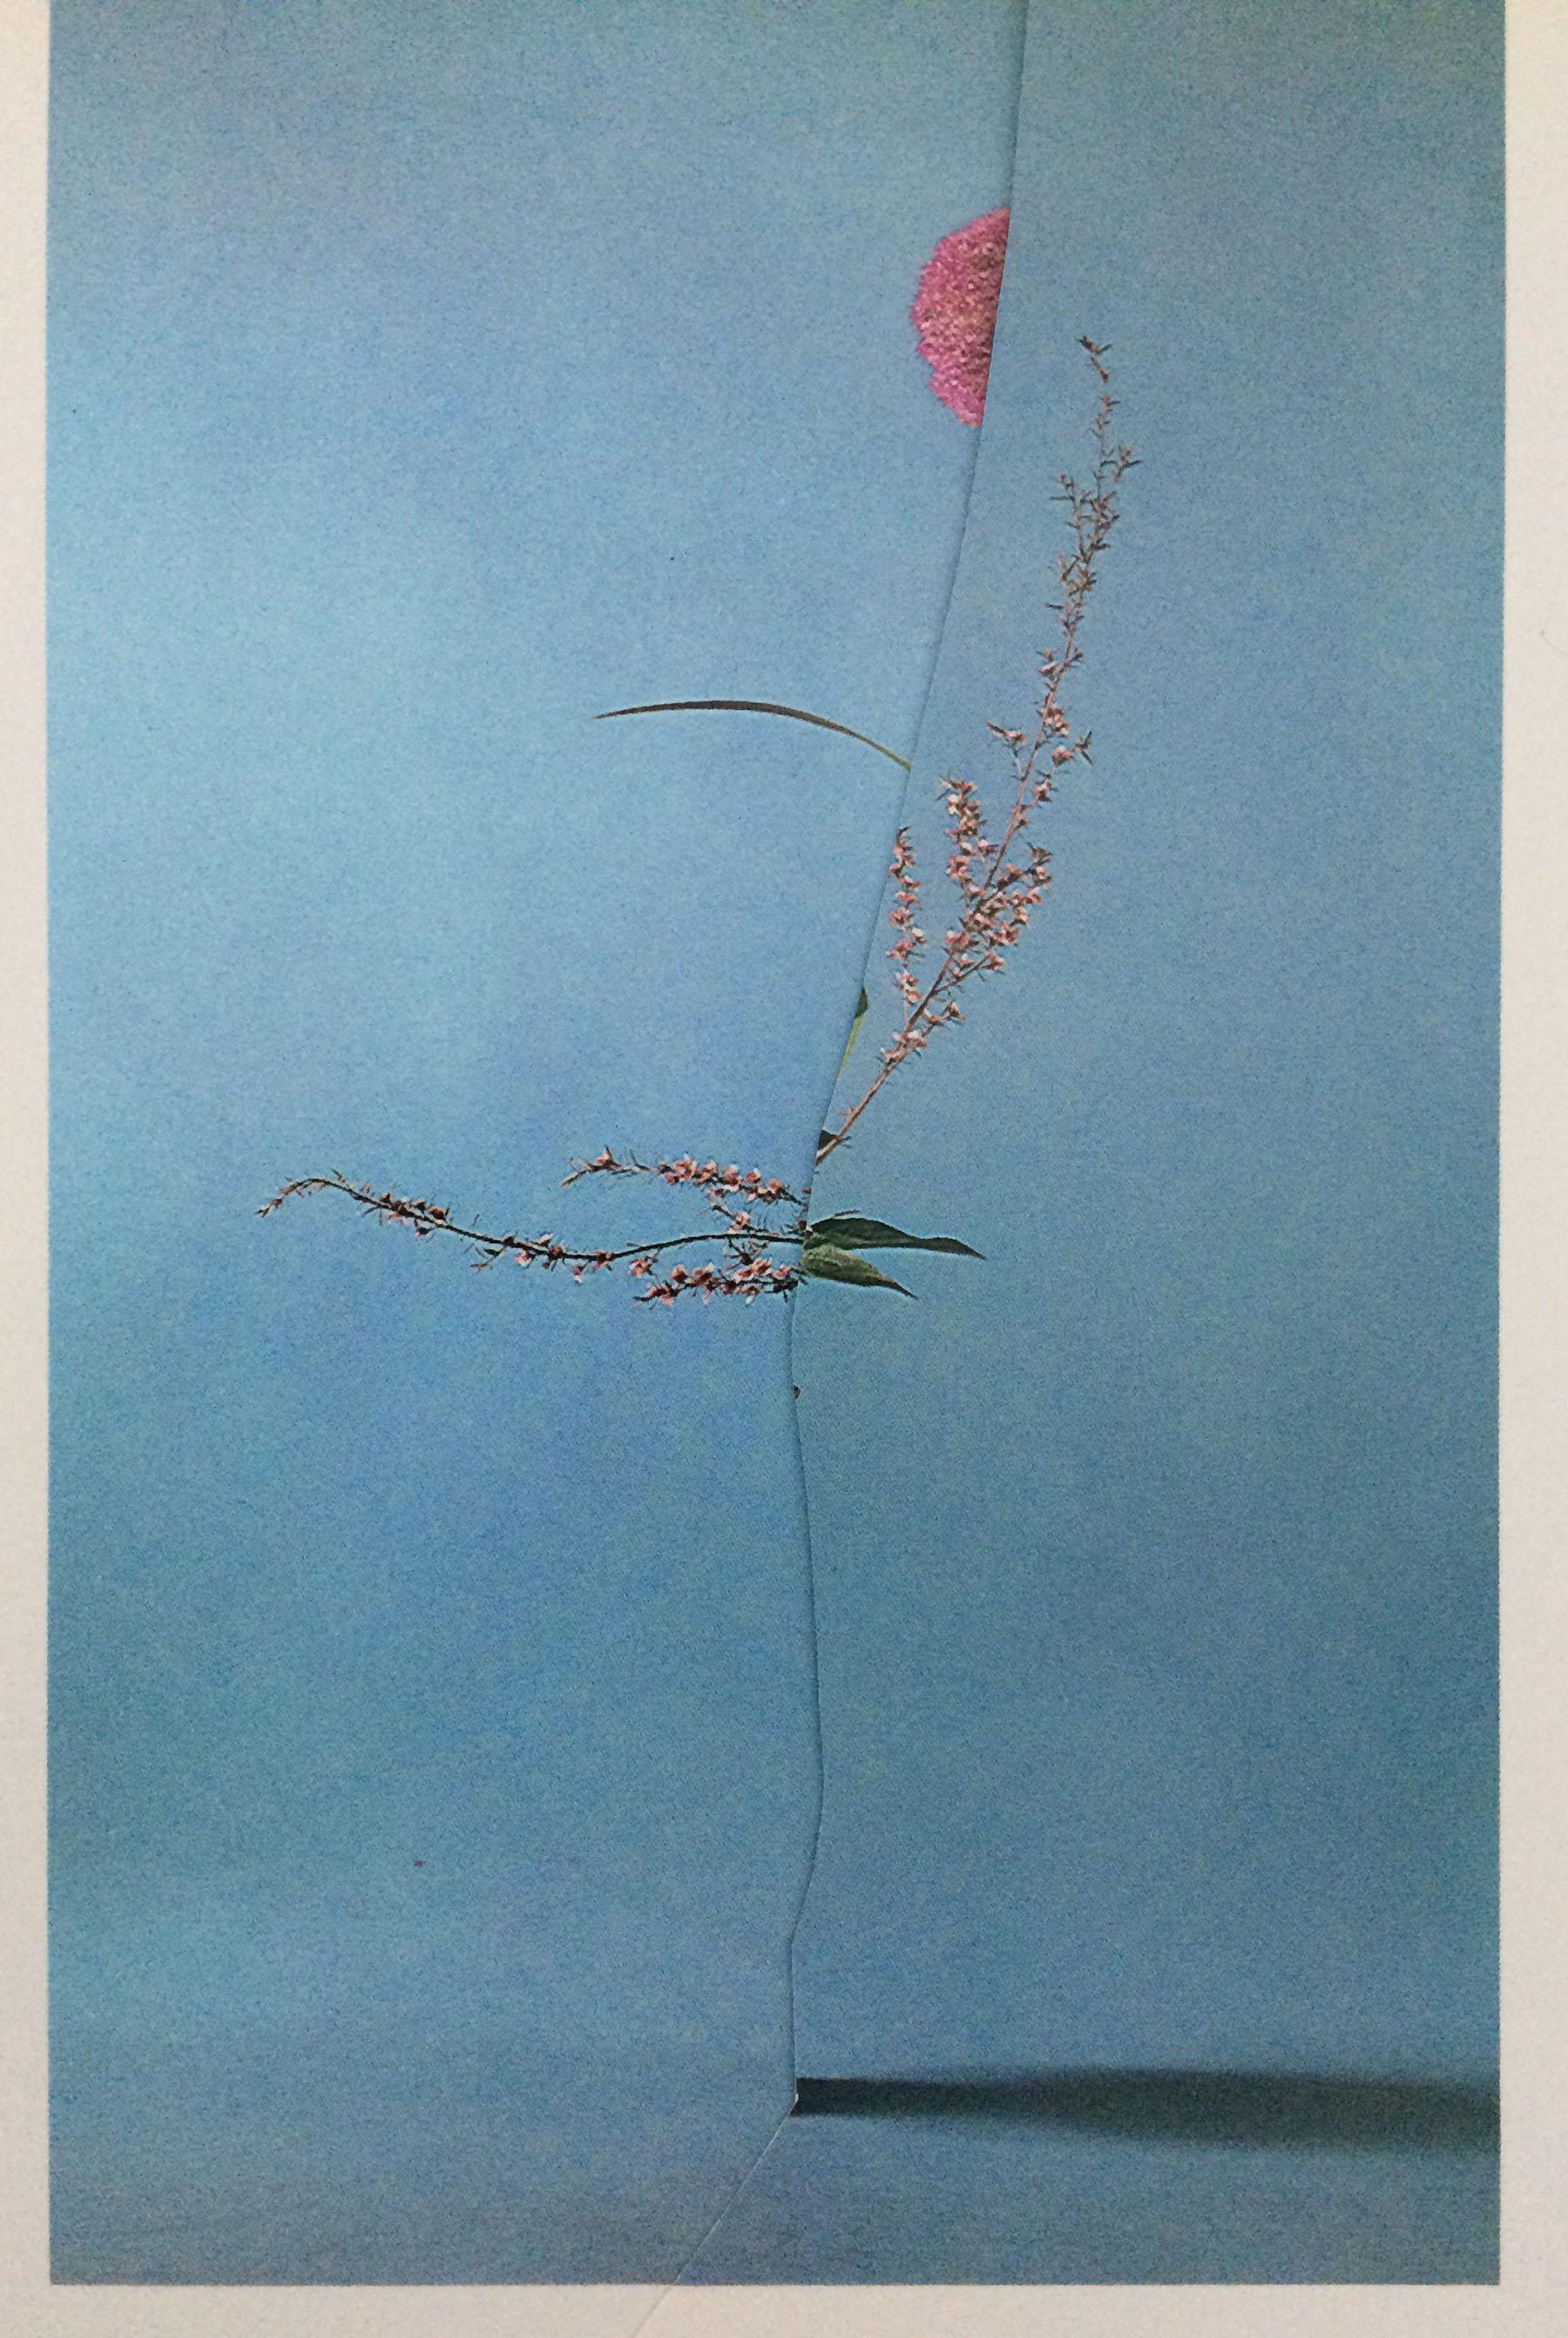 iGNANT-Art-Nicola-Kloosterman-Ikebana-010